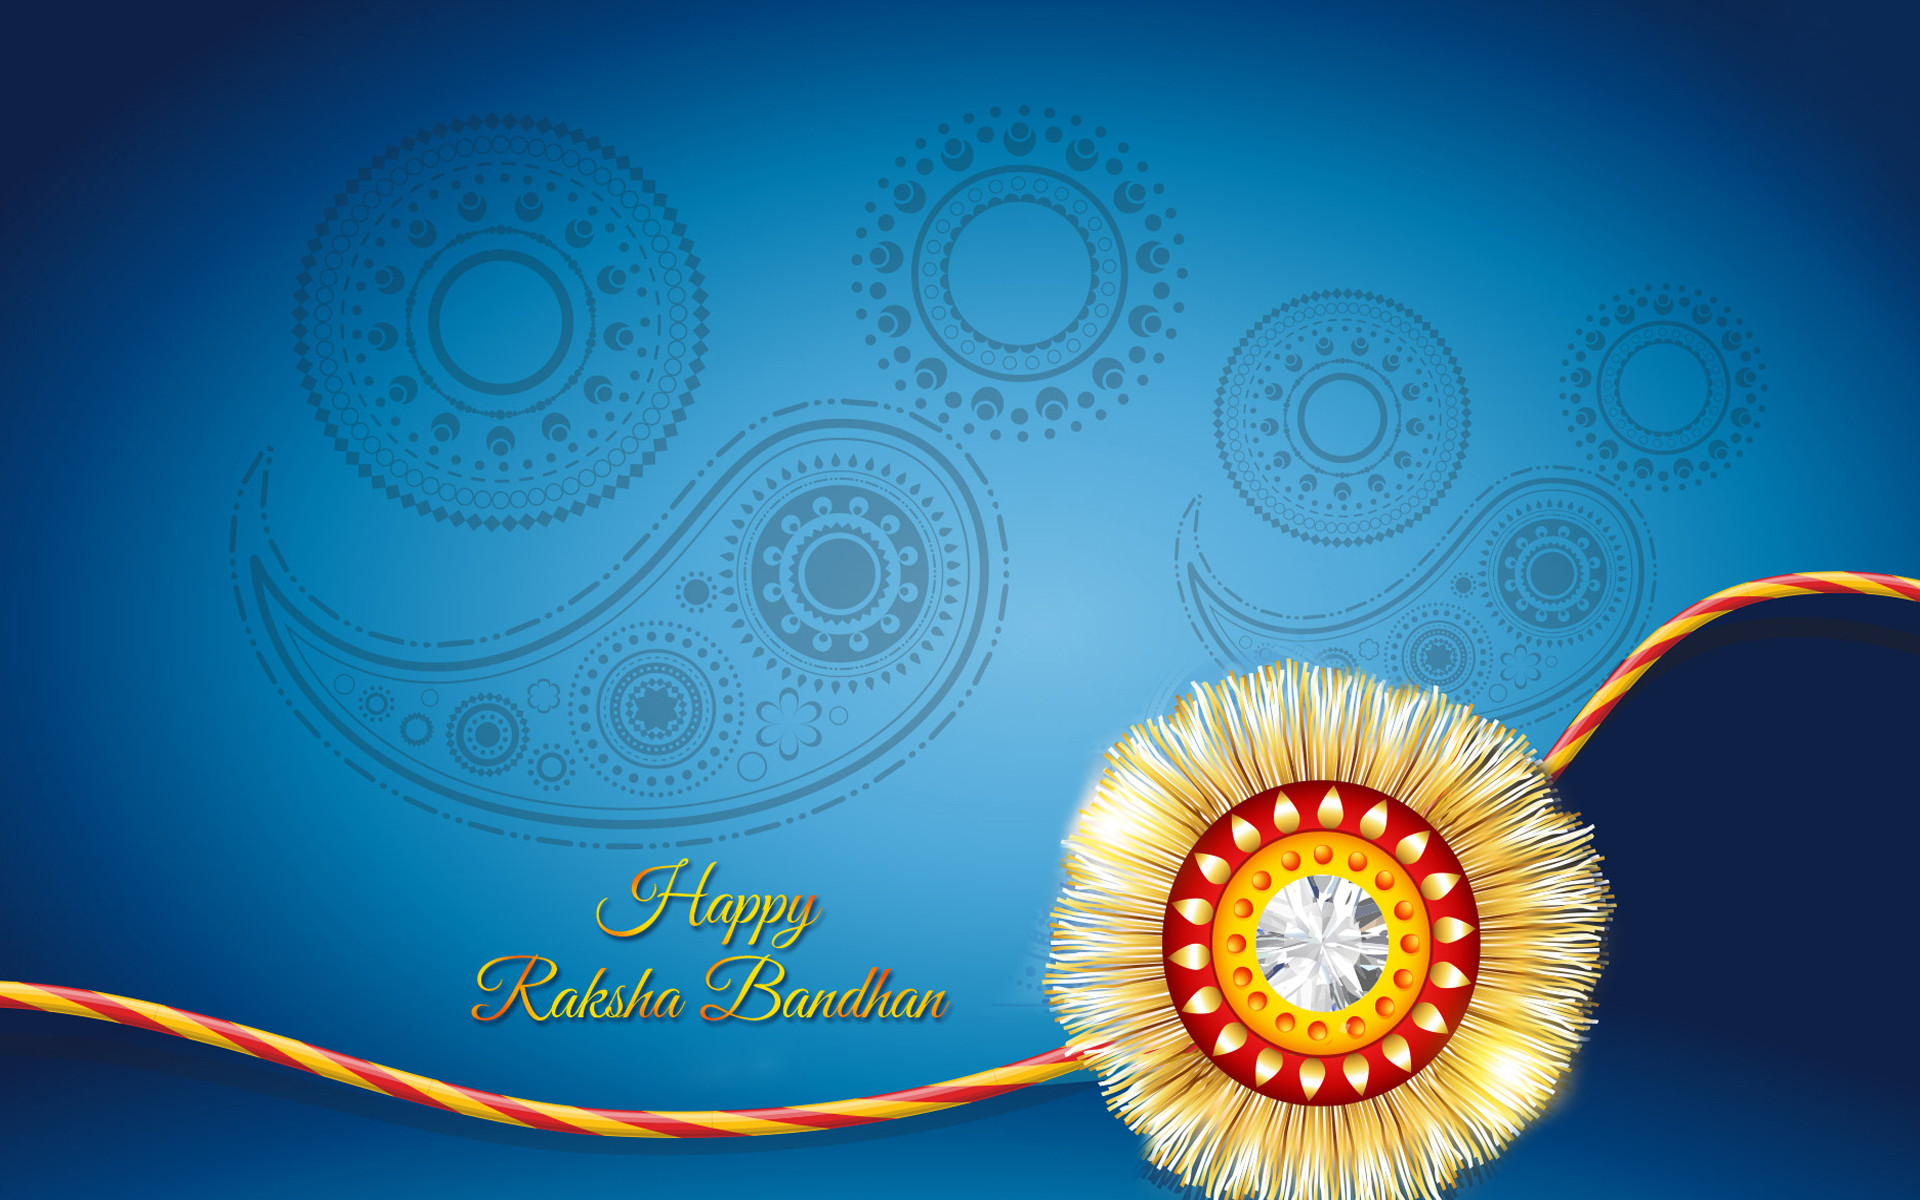 Res: 1920x1200, Happy Rakhi 2014 HD Wallpaper Raksha Bandhan, Brother, Sister, Rakhi,  Wallpapers, Wishes, Greetings, Images, Cute, Cartoon, Tied Rakhi, Latest, HD